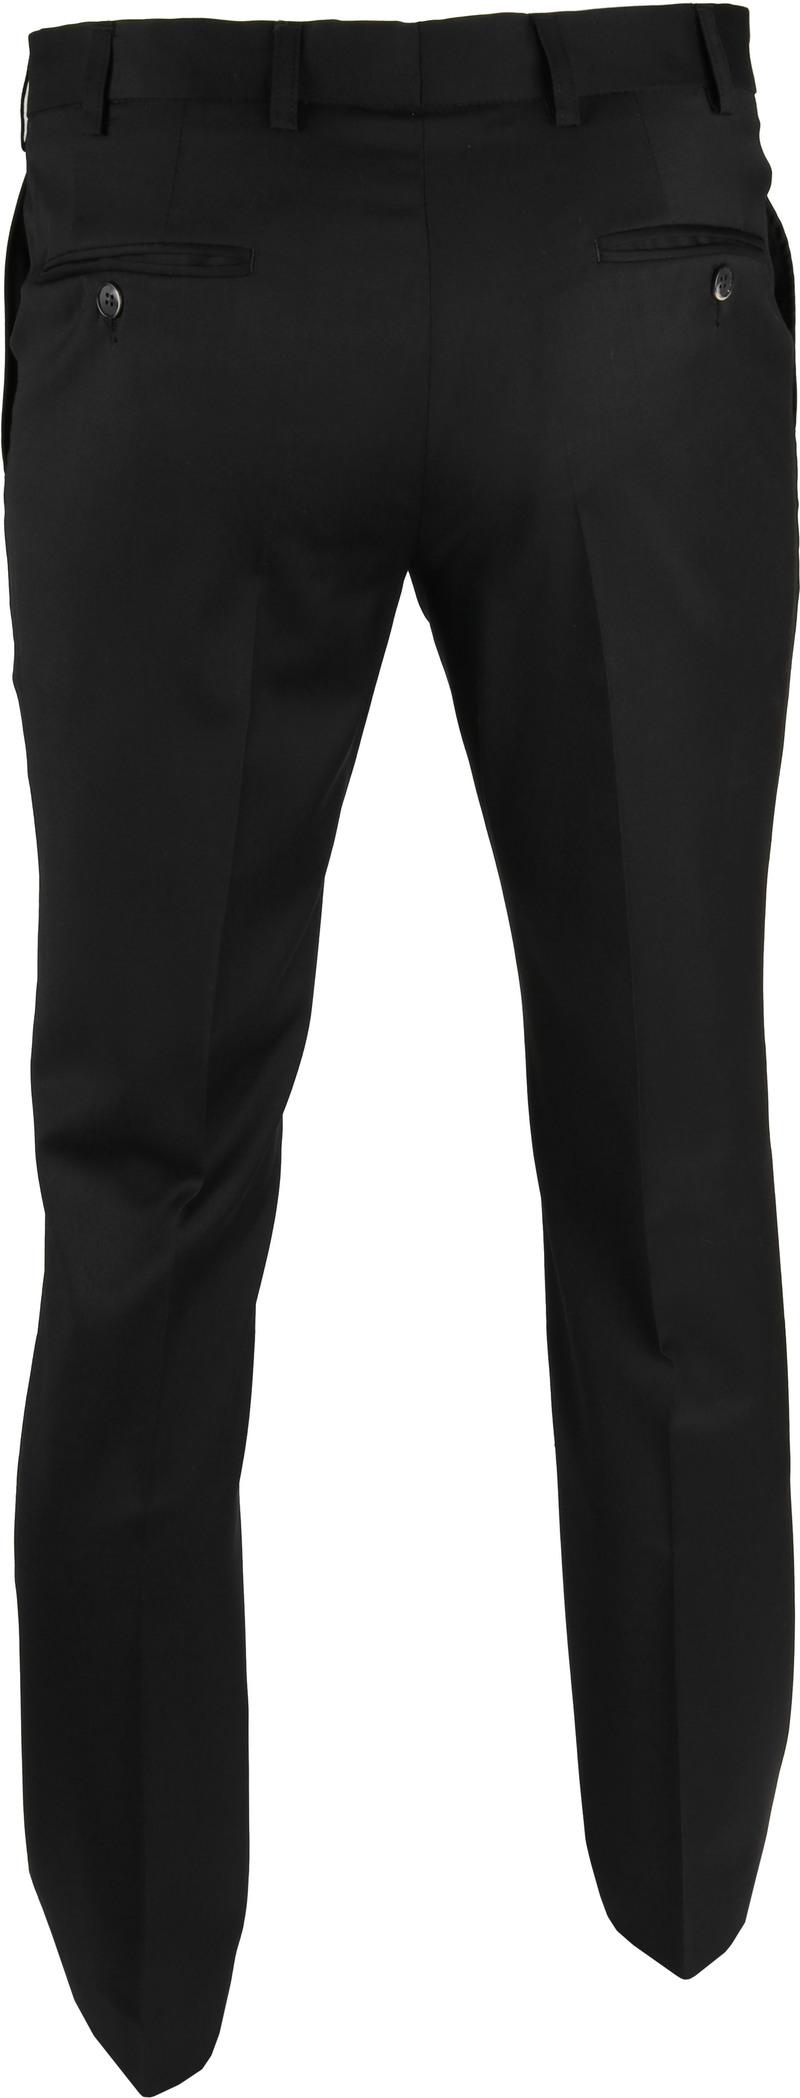 Suitable Pantalon Piga Black photo 3